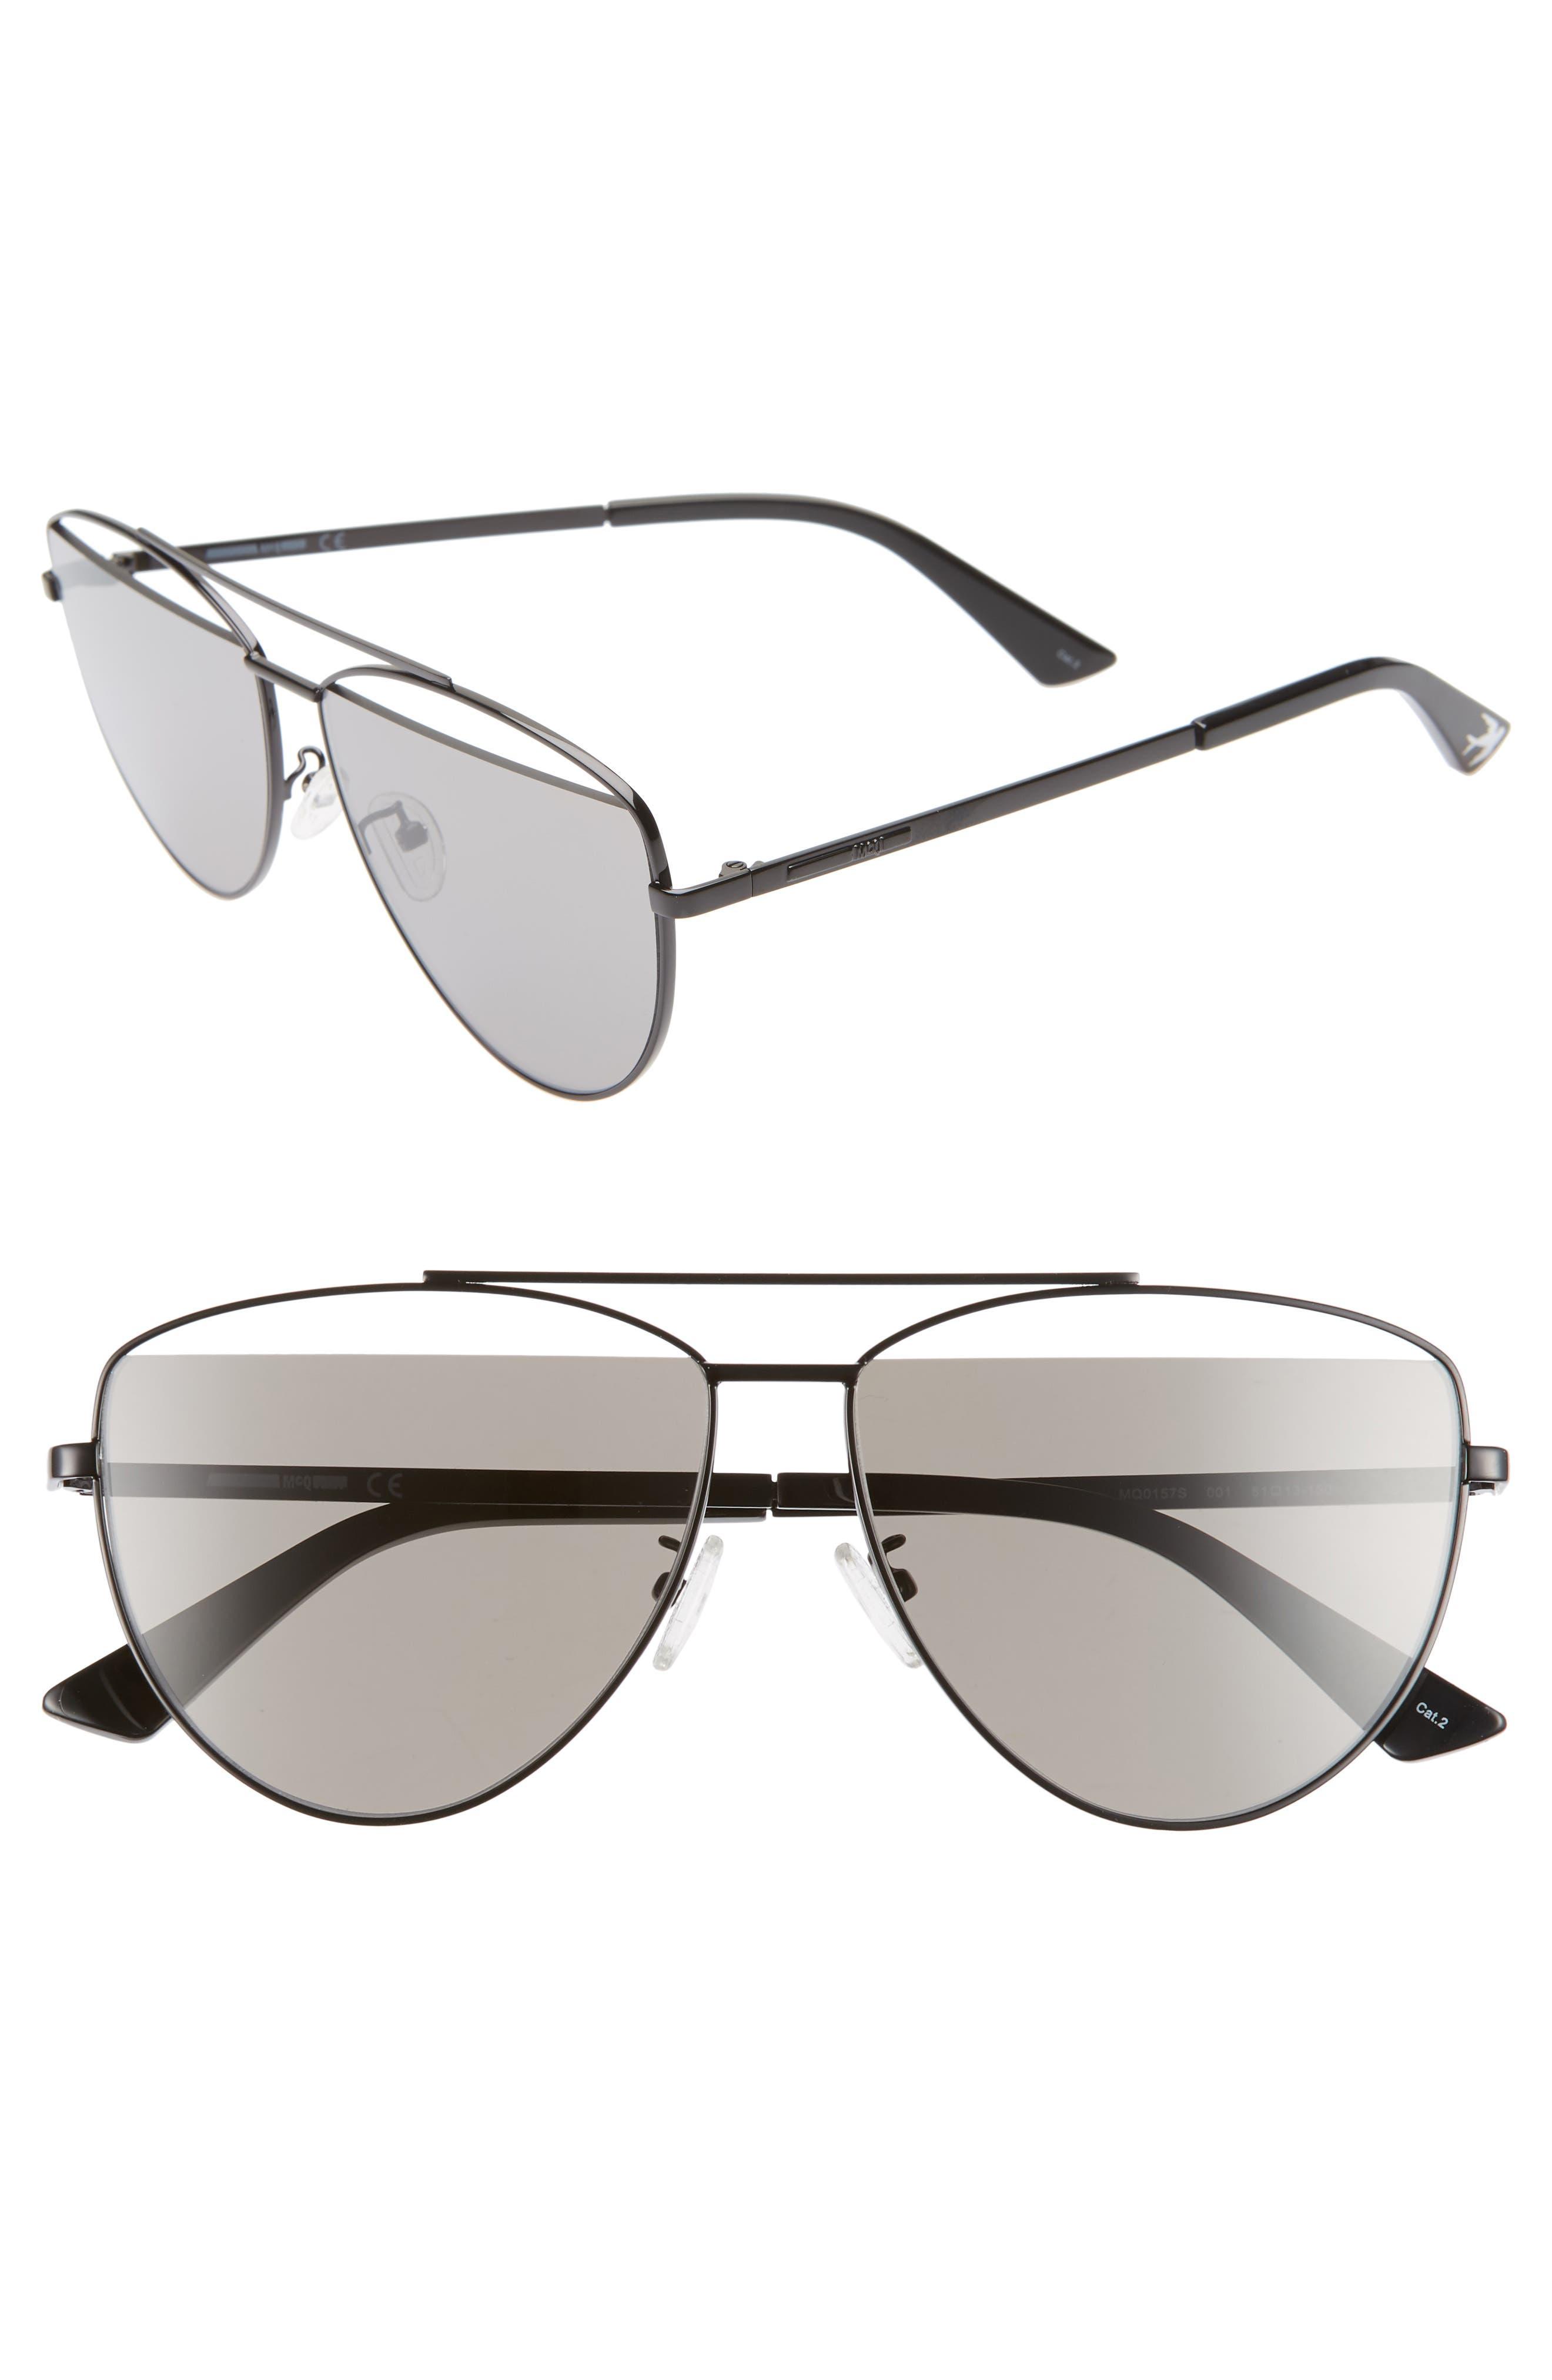 61mm Aviator Sunglasses, Main, color, BLACK/ GREY